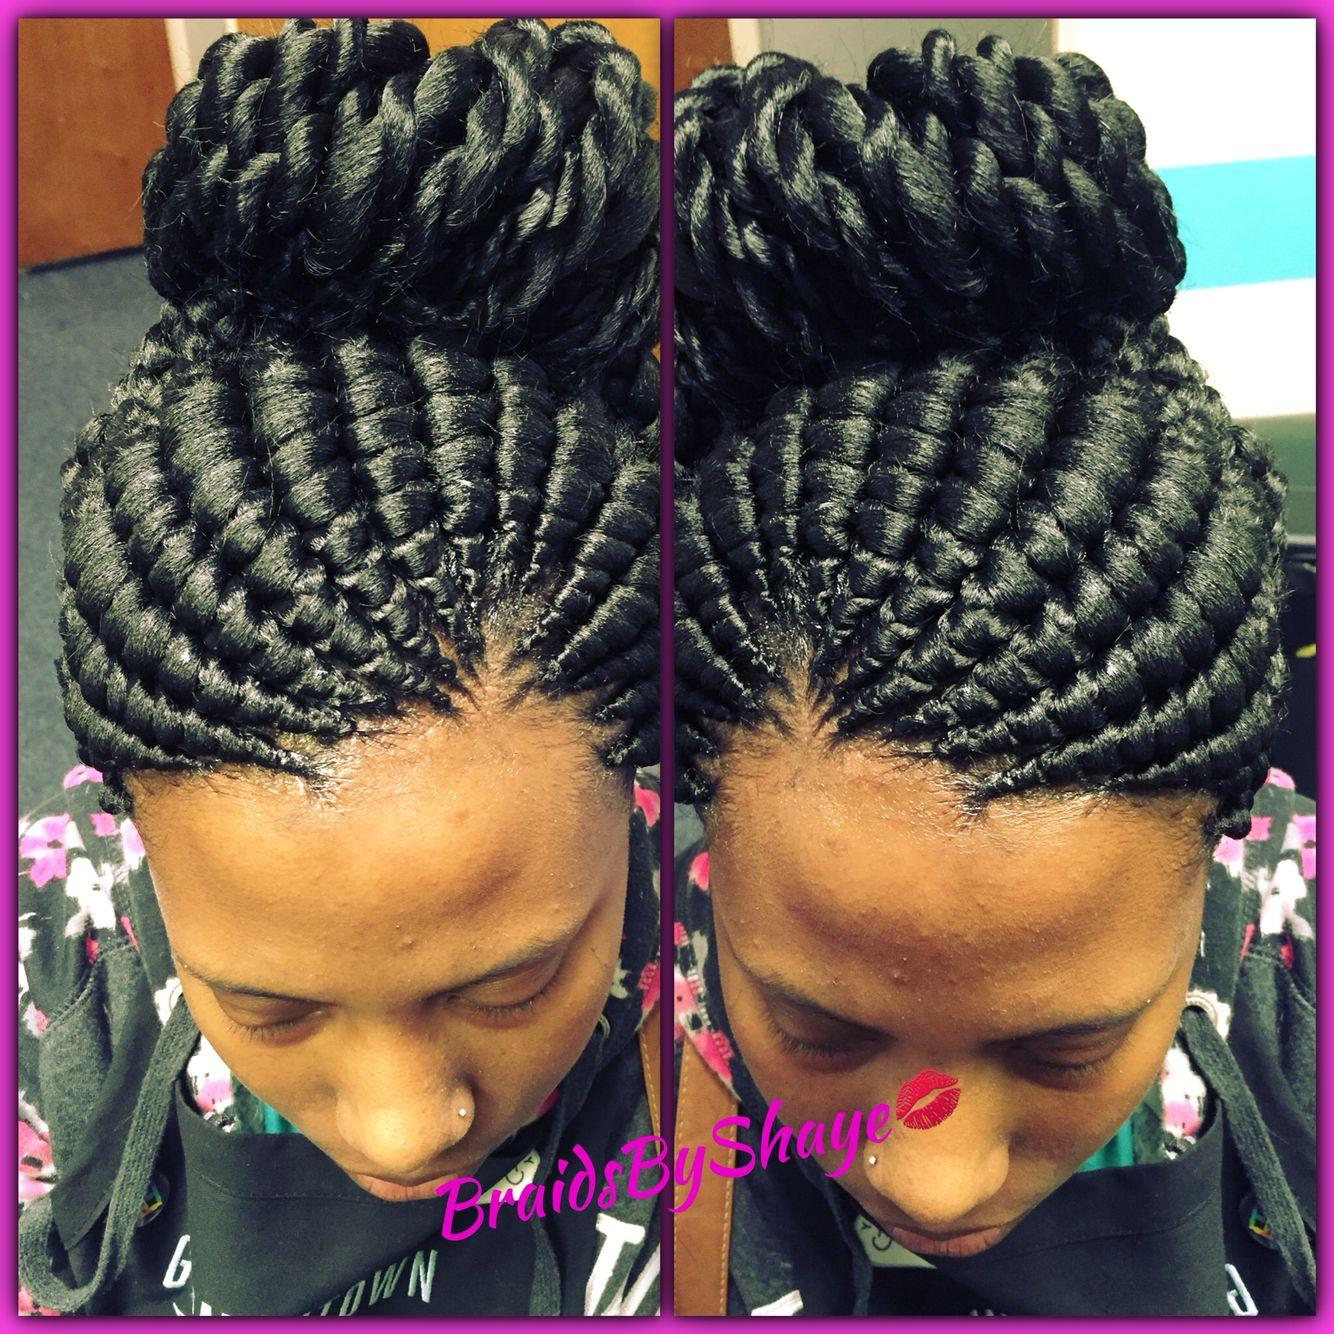 The Latest 26 Trends Of This Season For Ghana Hair Braids hairstyleforblackwomen.net 6